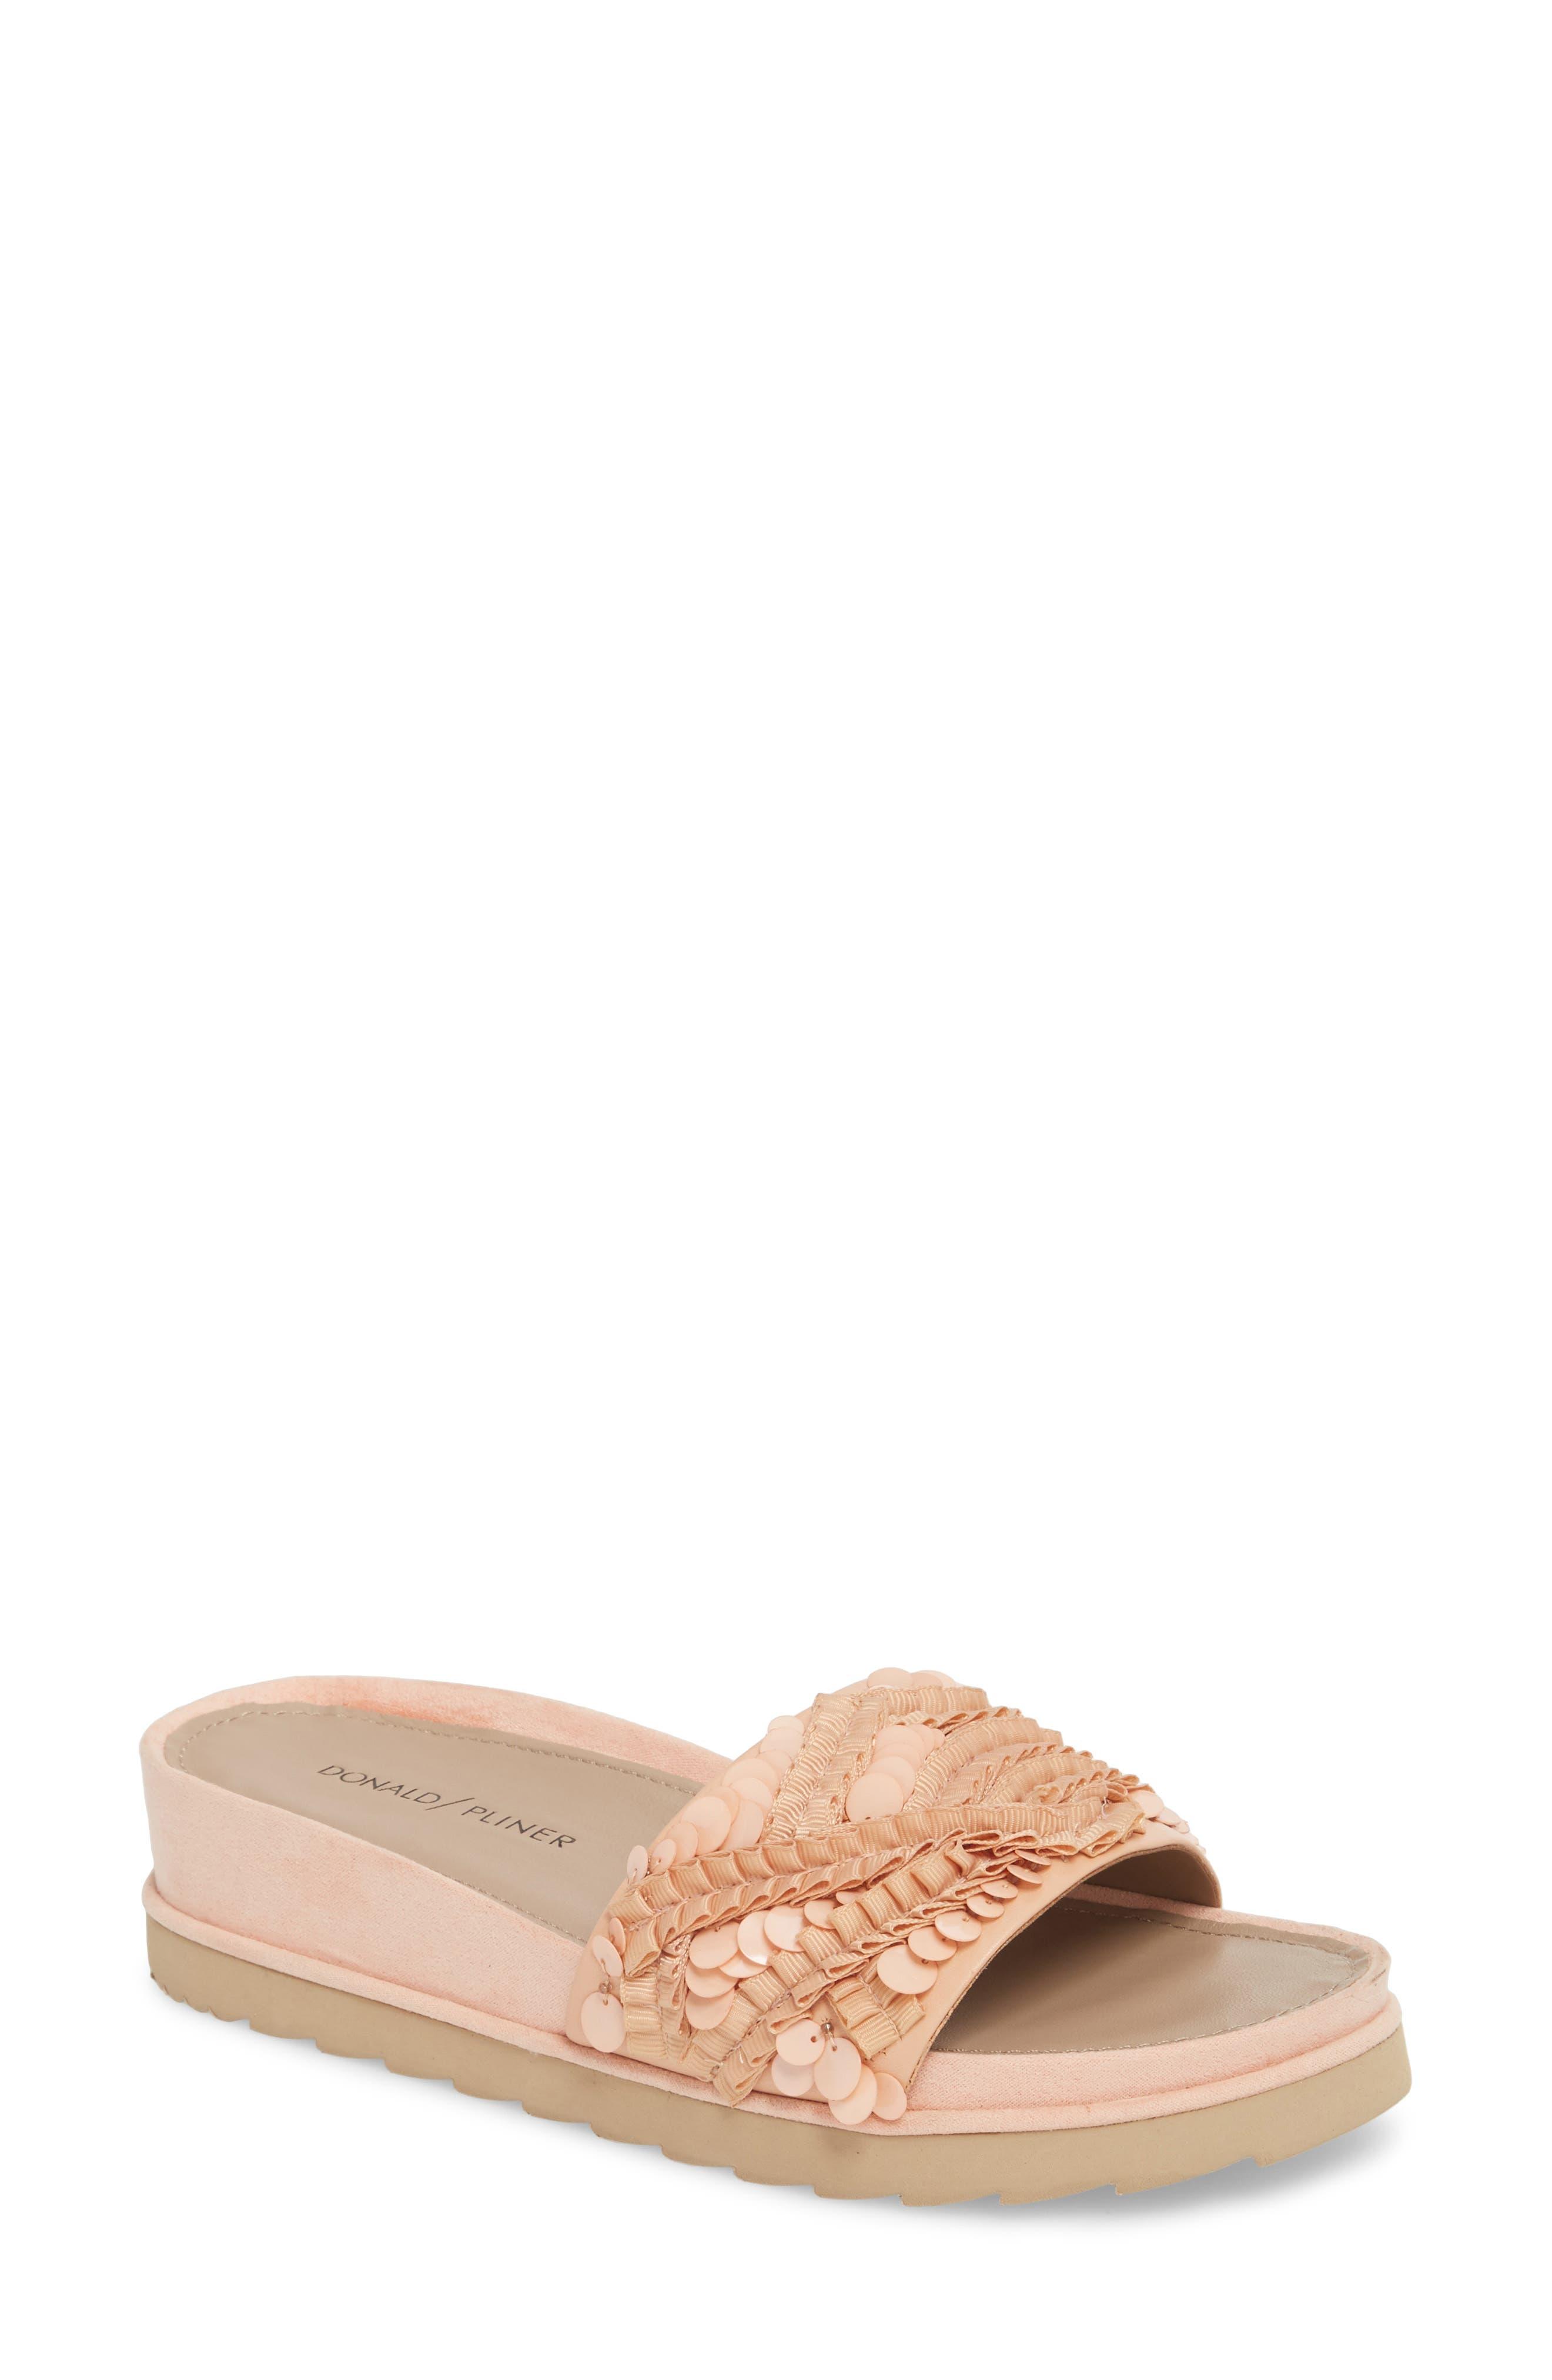 Cava Slide Sandal,                             Main thumbnail 1, color,                             Peony Leather